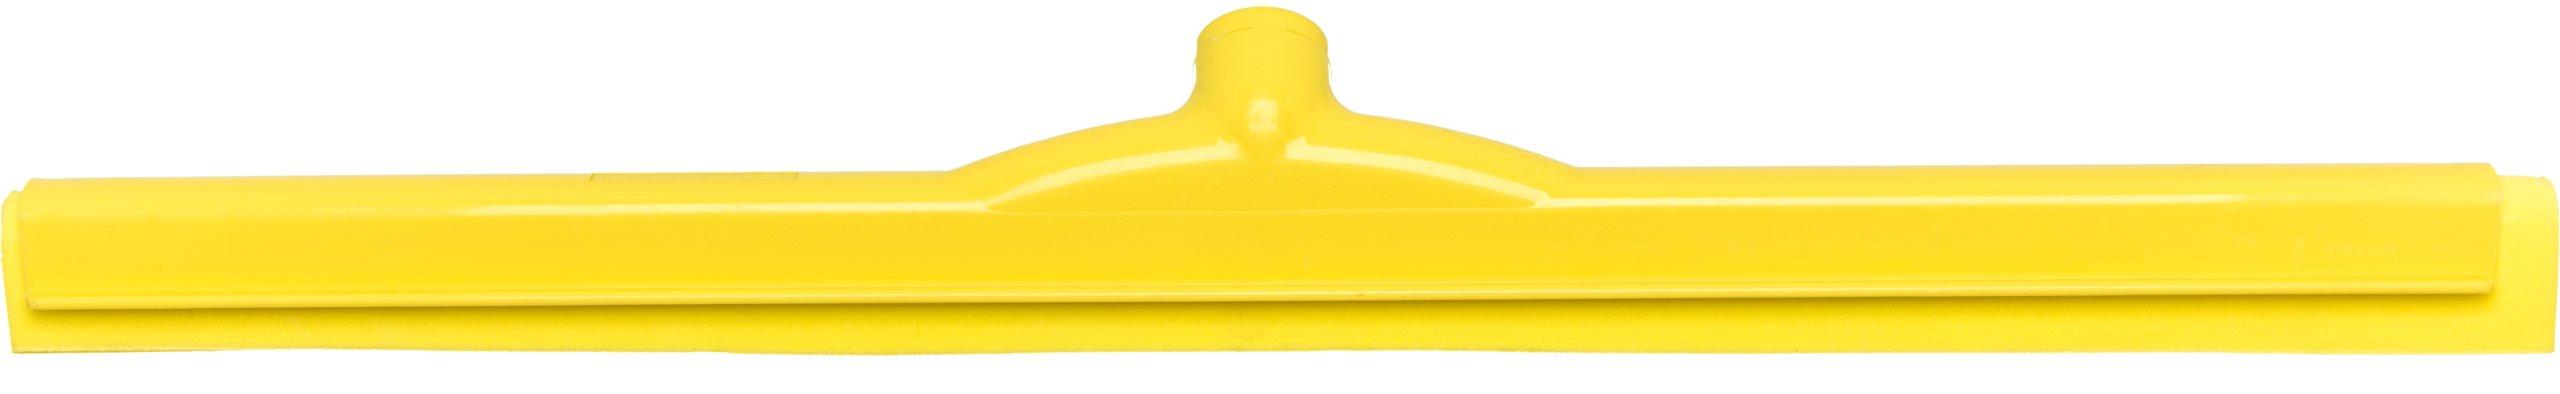 Carlisle 4156804 Spectrum Double Foam Rubber Floor Squeegee, 24'' Width, Yellow (Case of 6) by Carlisle (Image #2)